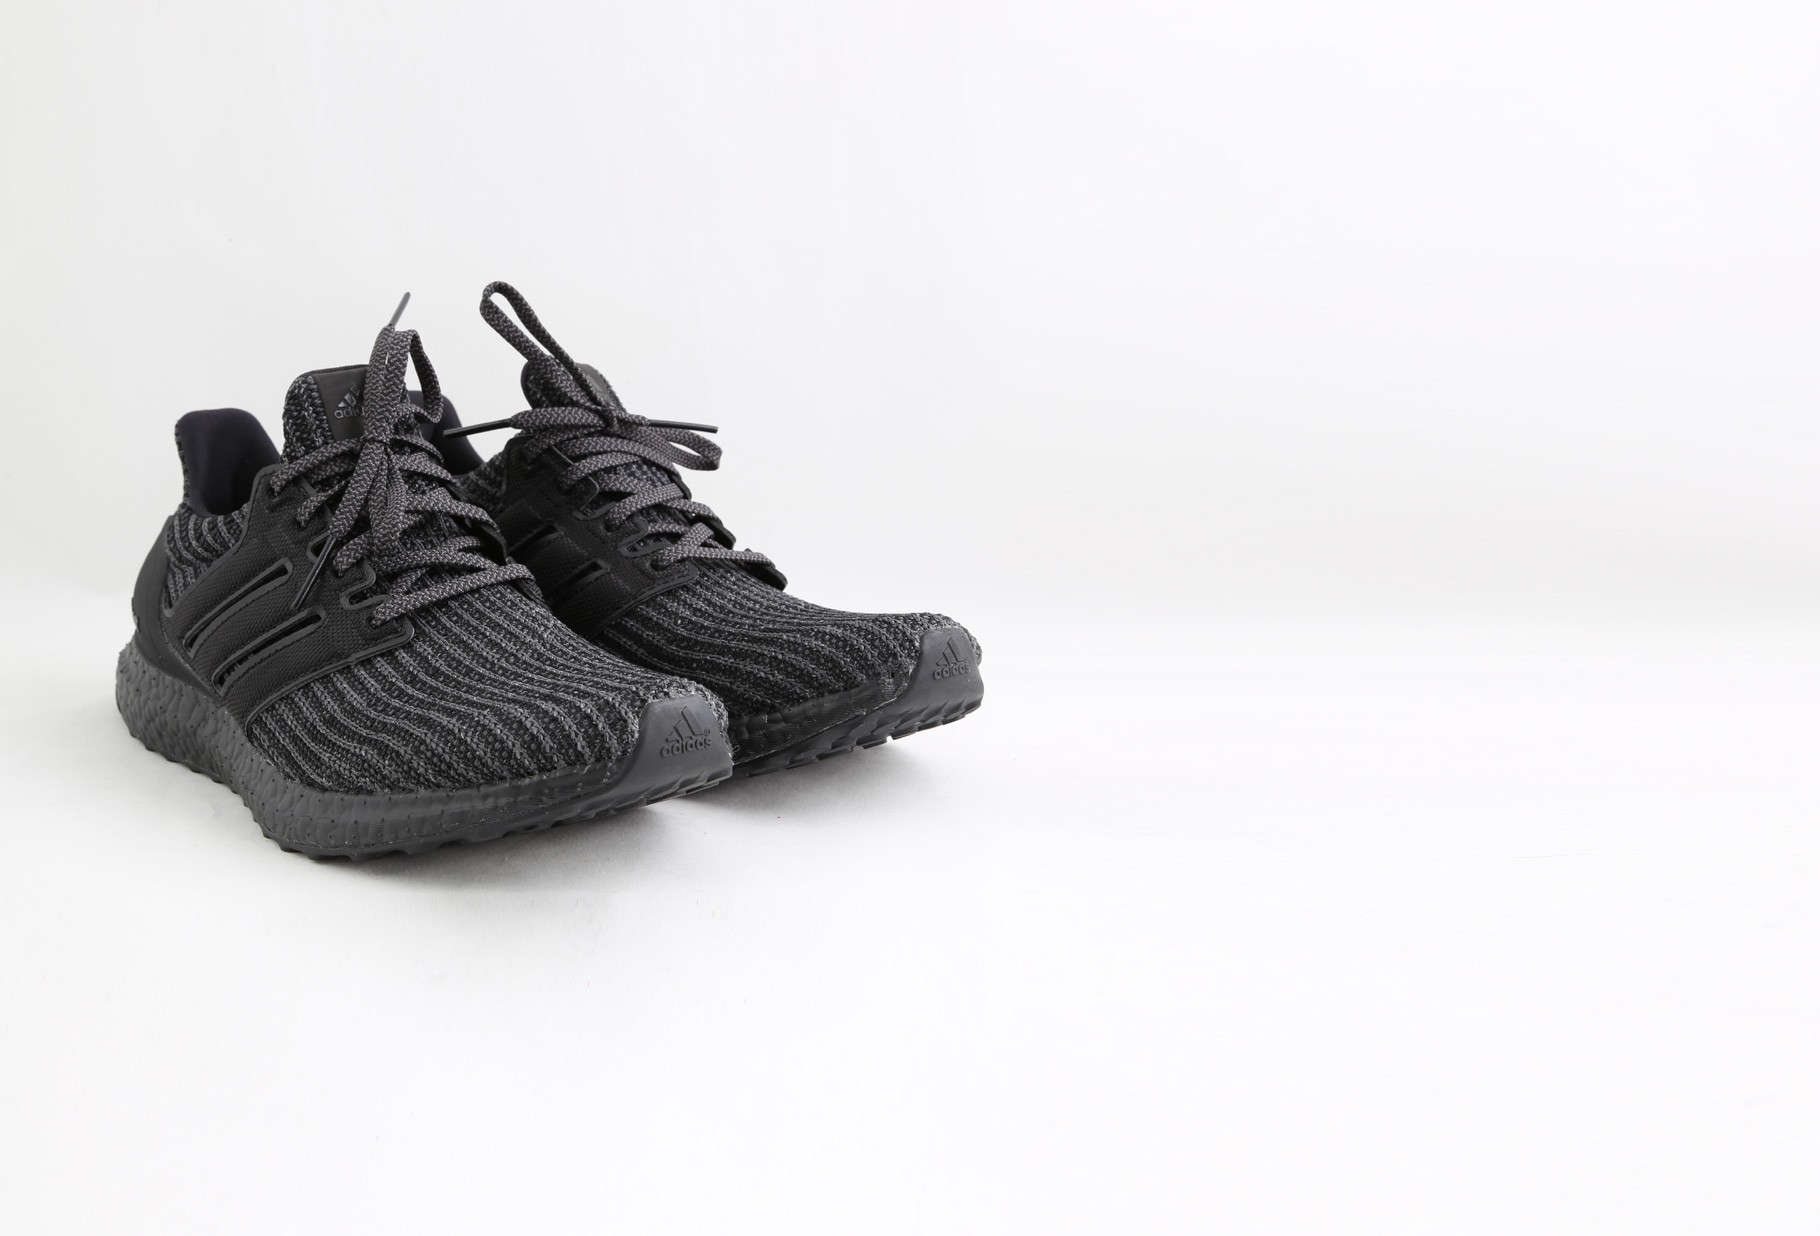 Ultra boost 4.0 Black